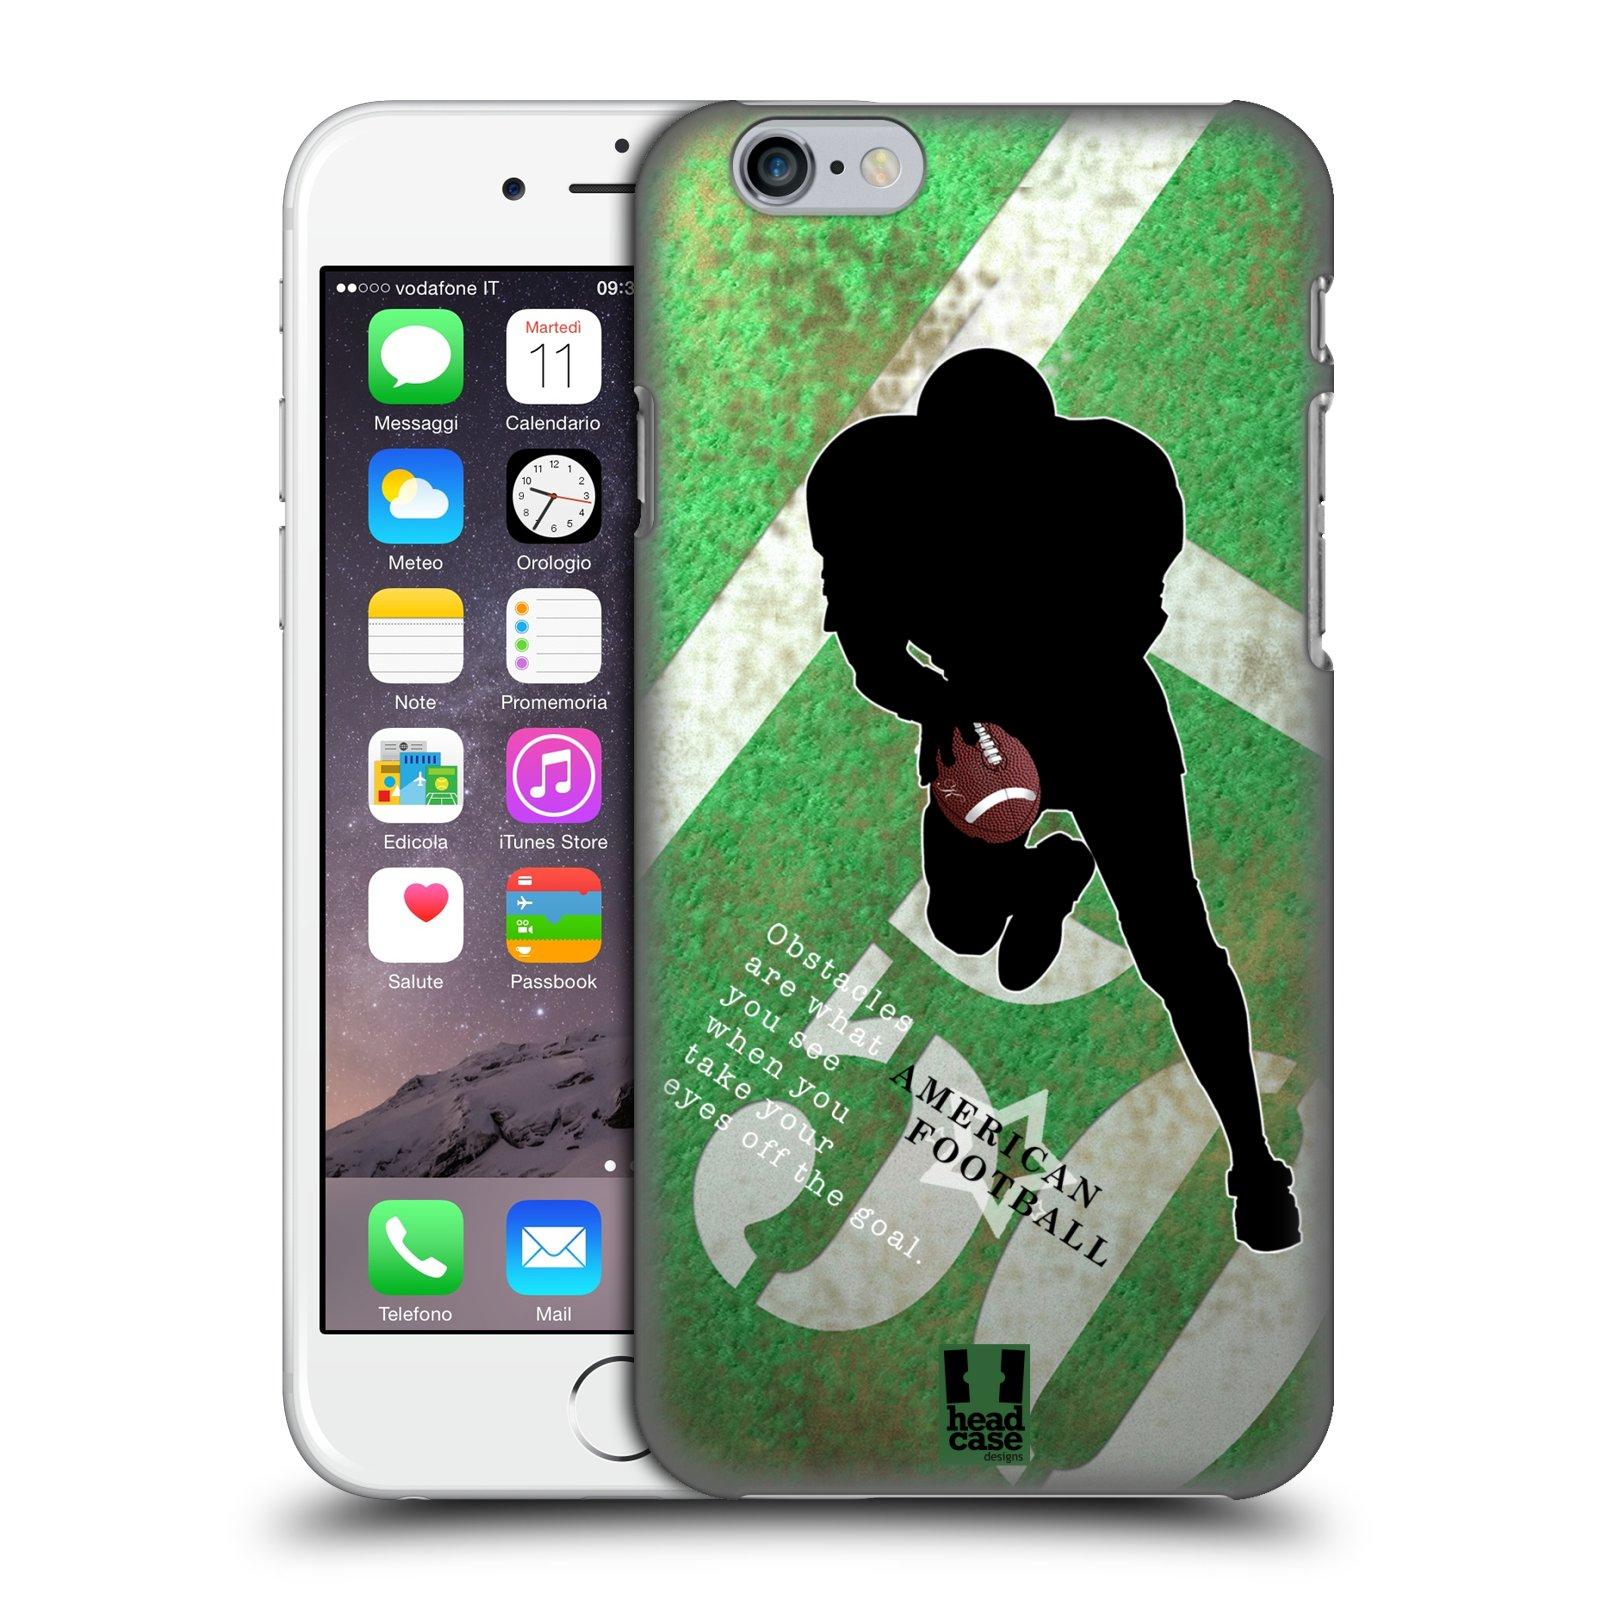 Head case designs extreme sports hard back case for apple for Case design